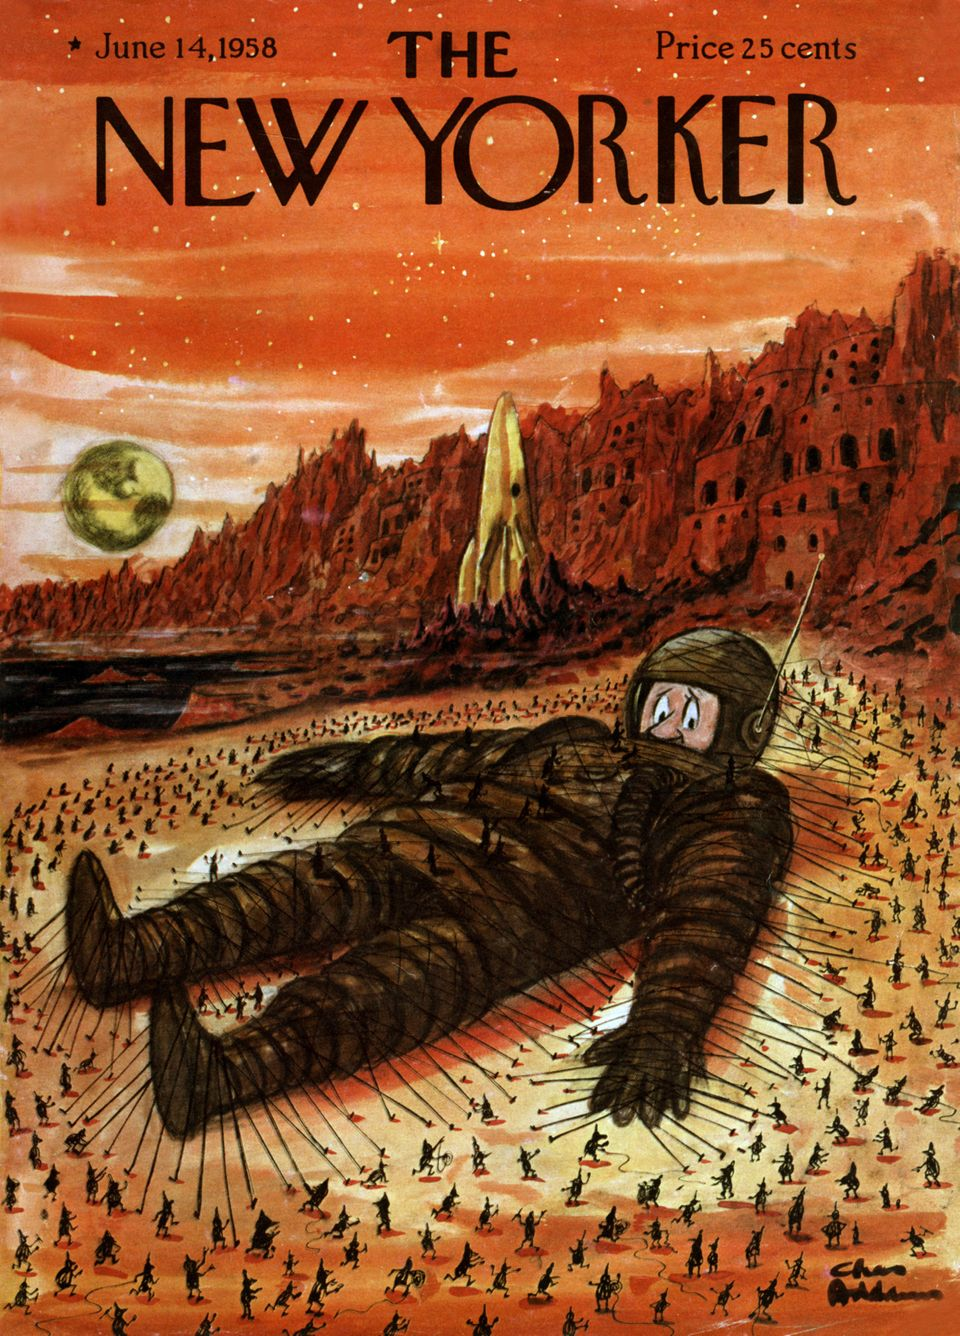 The New Yorker: Οι ιστορίες, οι εξελίξεις και οι πρωταγωνιστές που χαρακτήρισαν τα ωραιότερα εξώφυλλα...